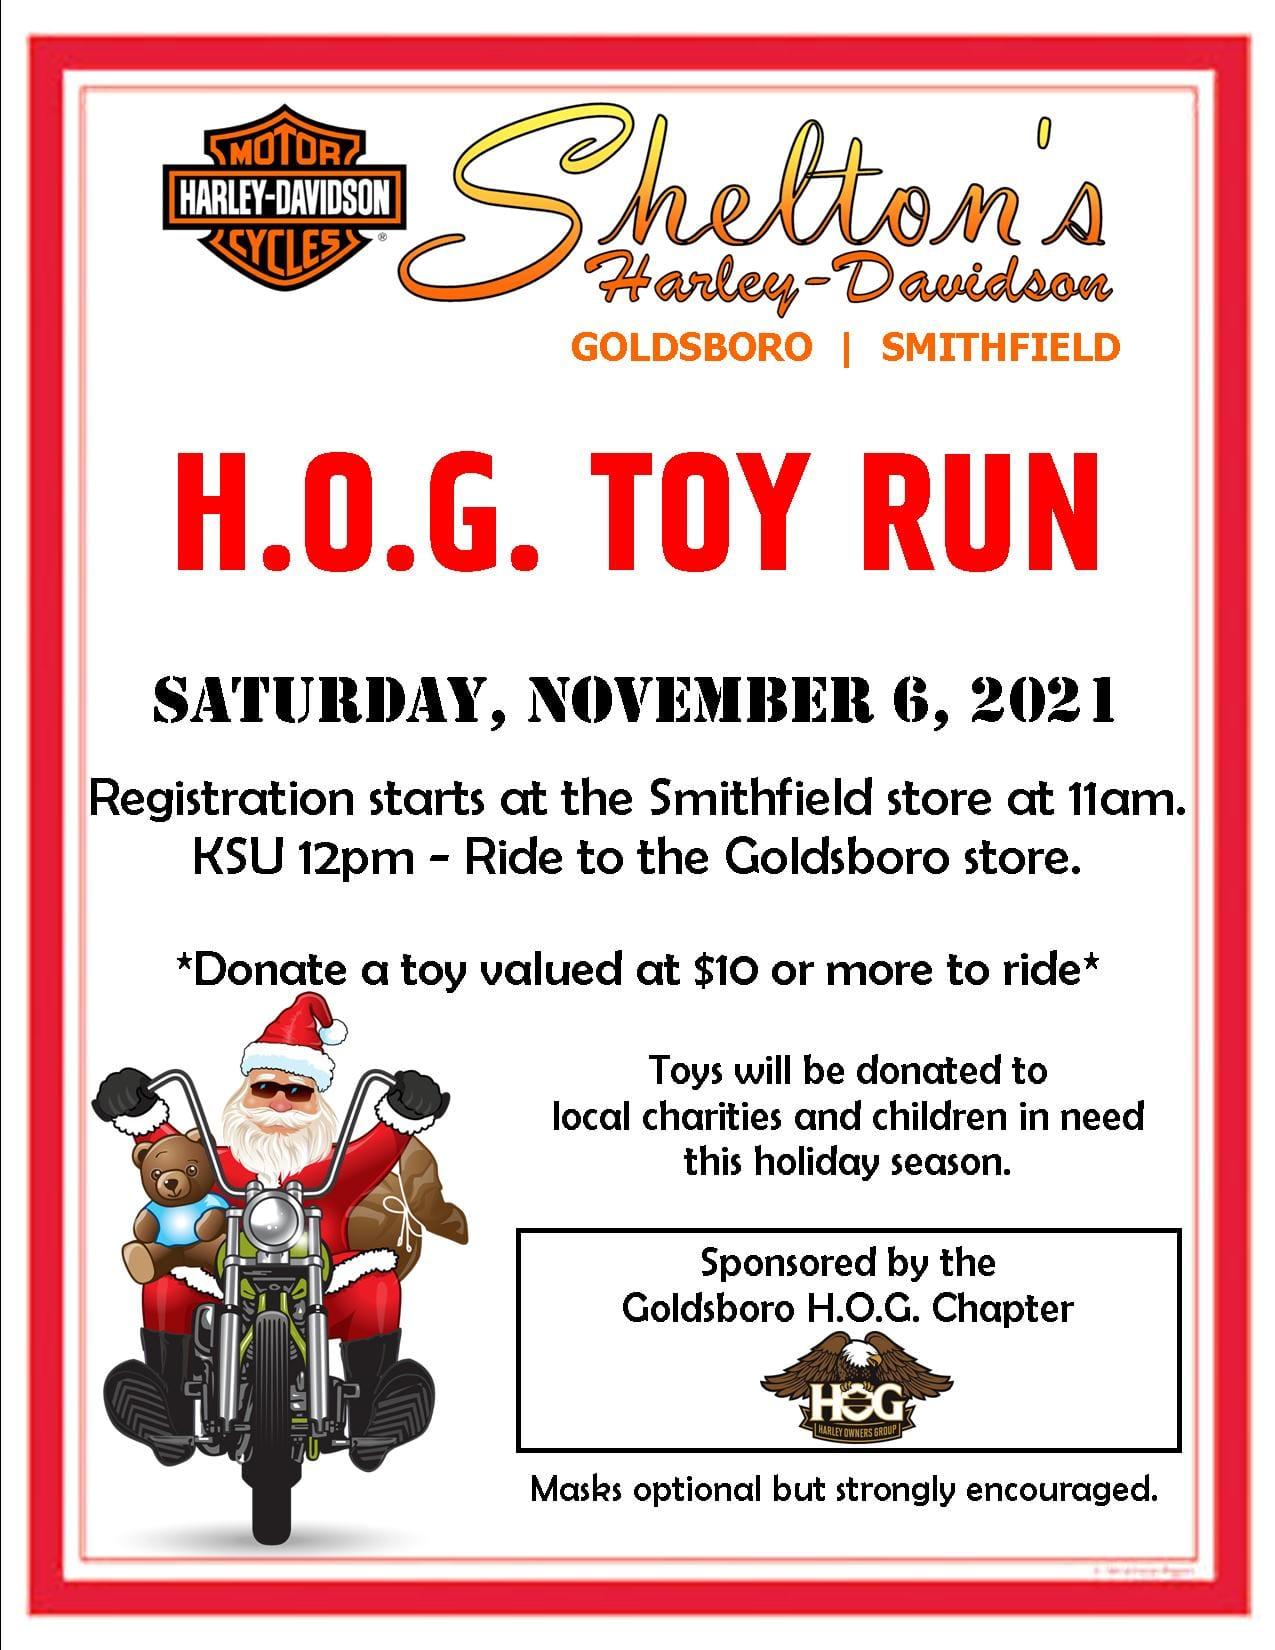 Goldsboro H.O.G. Chapter Toy Run